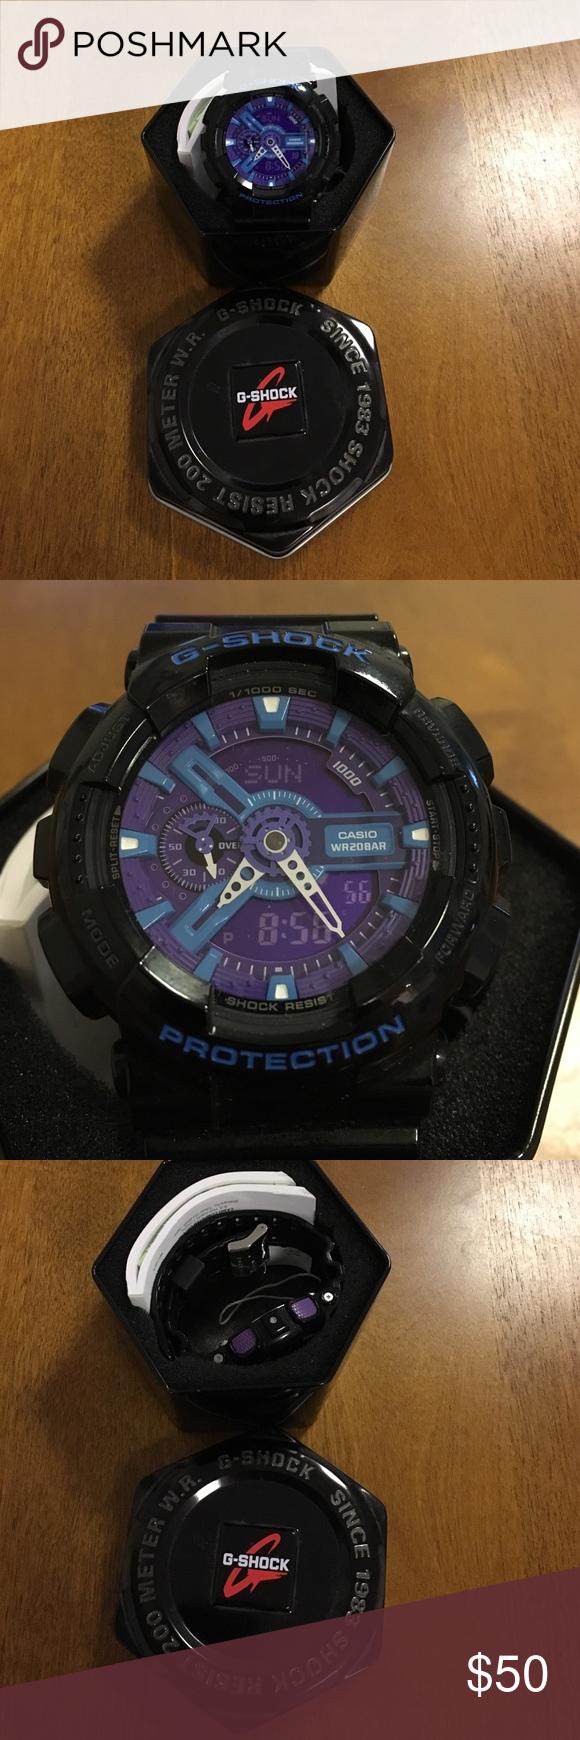 Casio G Shock Watch Module No 3230 3232 My Posh Closet